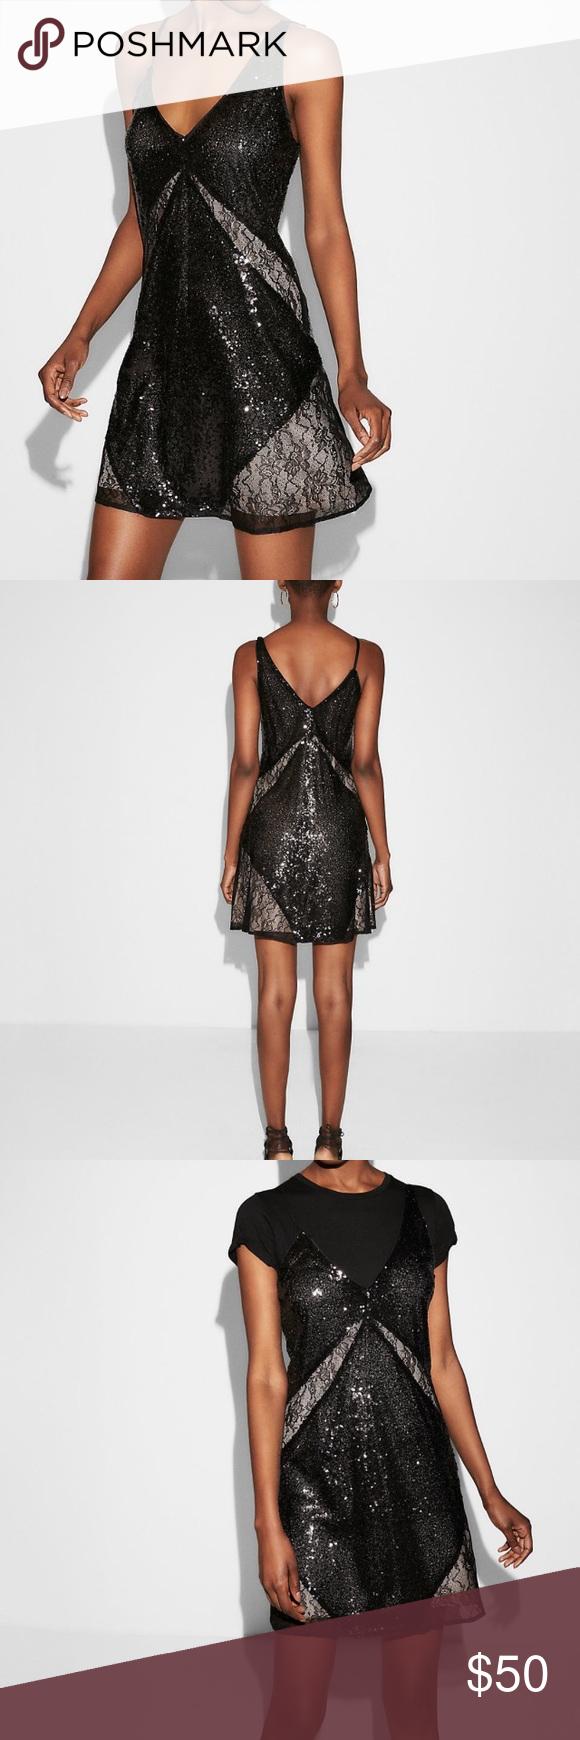 Express Sequin Lace Shift Dress  My Posh Picks  Pinterest